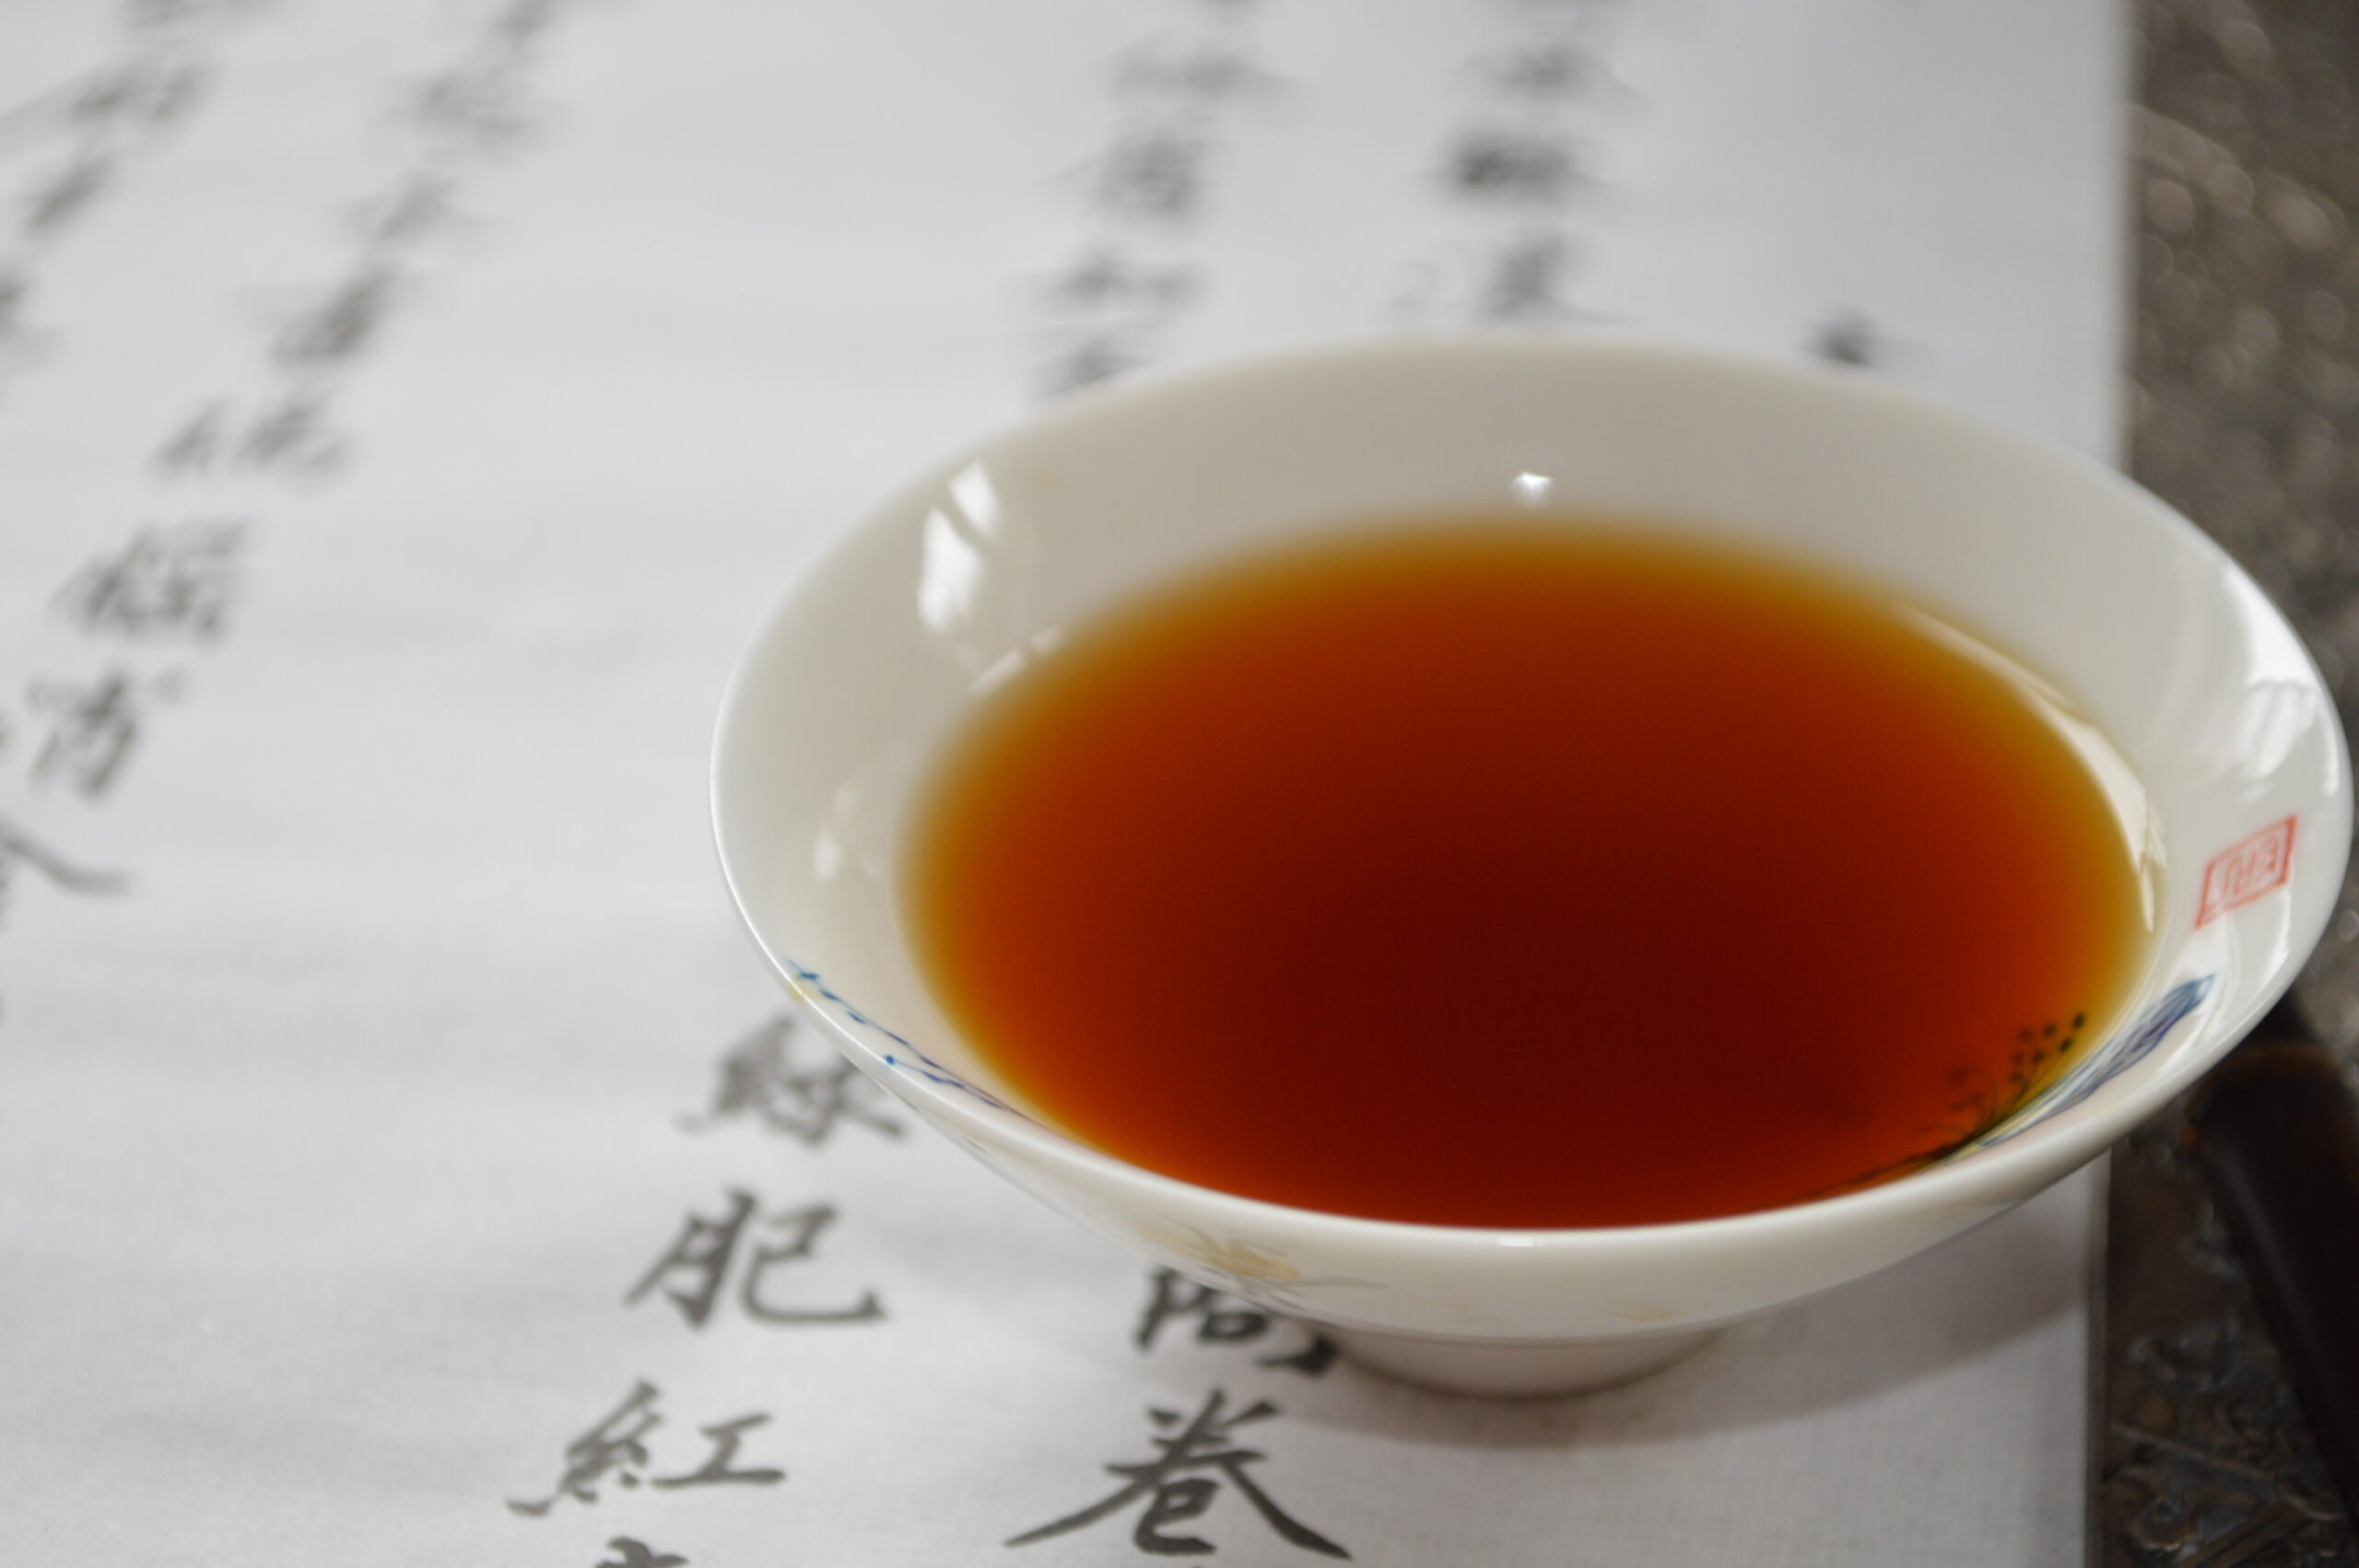 https://shop.liu-tea-art.com/wp-content/uploads/2018/07/DSC_0063-scaled.jpg